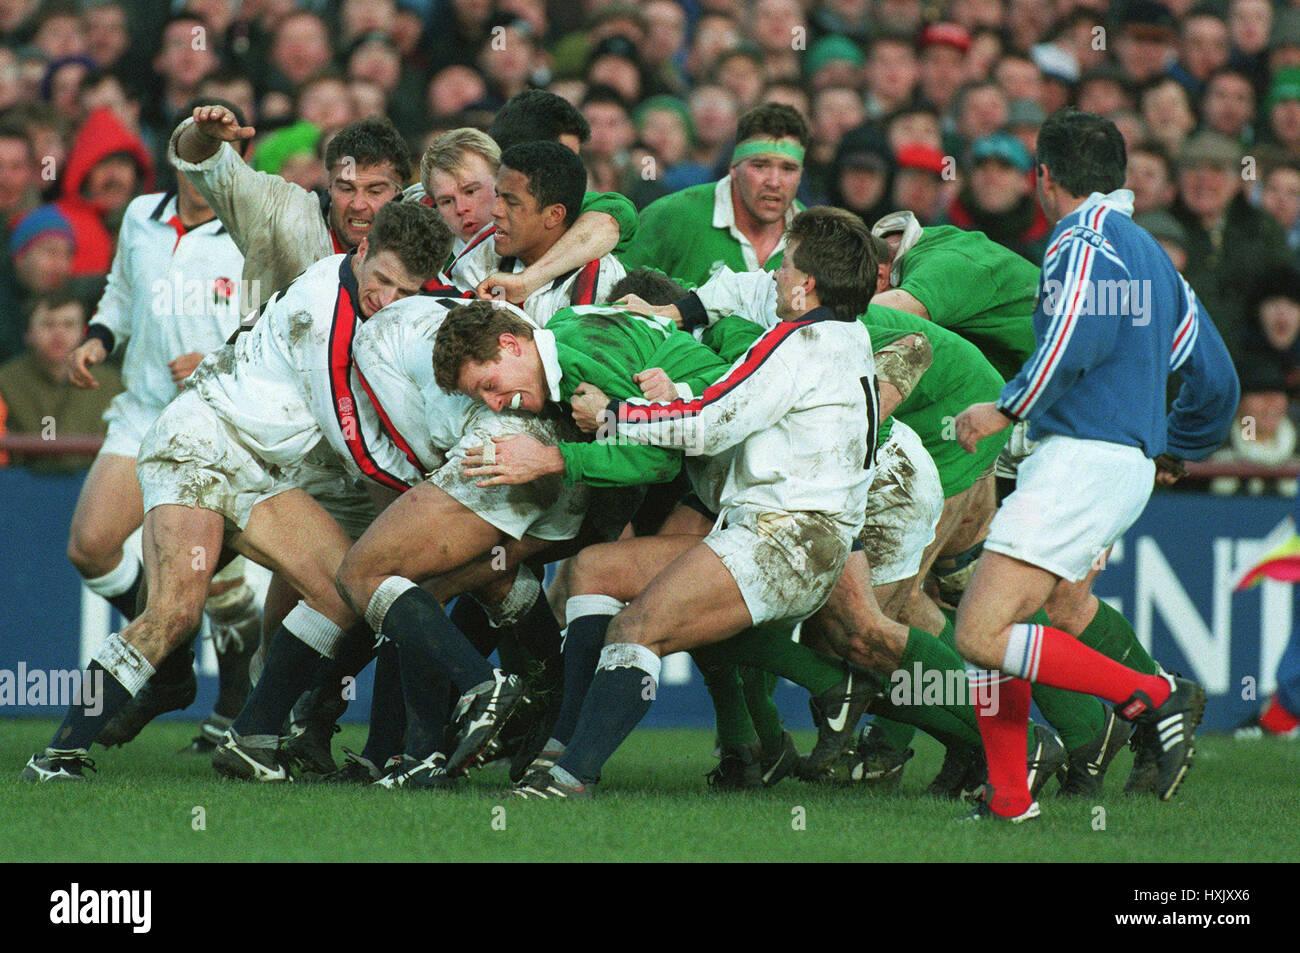 ENGLAND & IRELAND BATTLE FOR POSSESSION AT LANSDOWNE ROAD 21 January 1995 - Stock Image